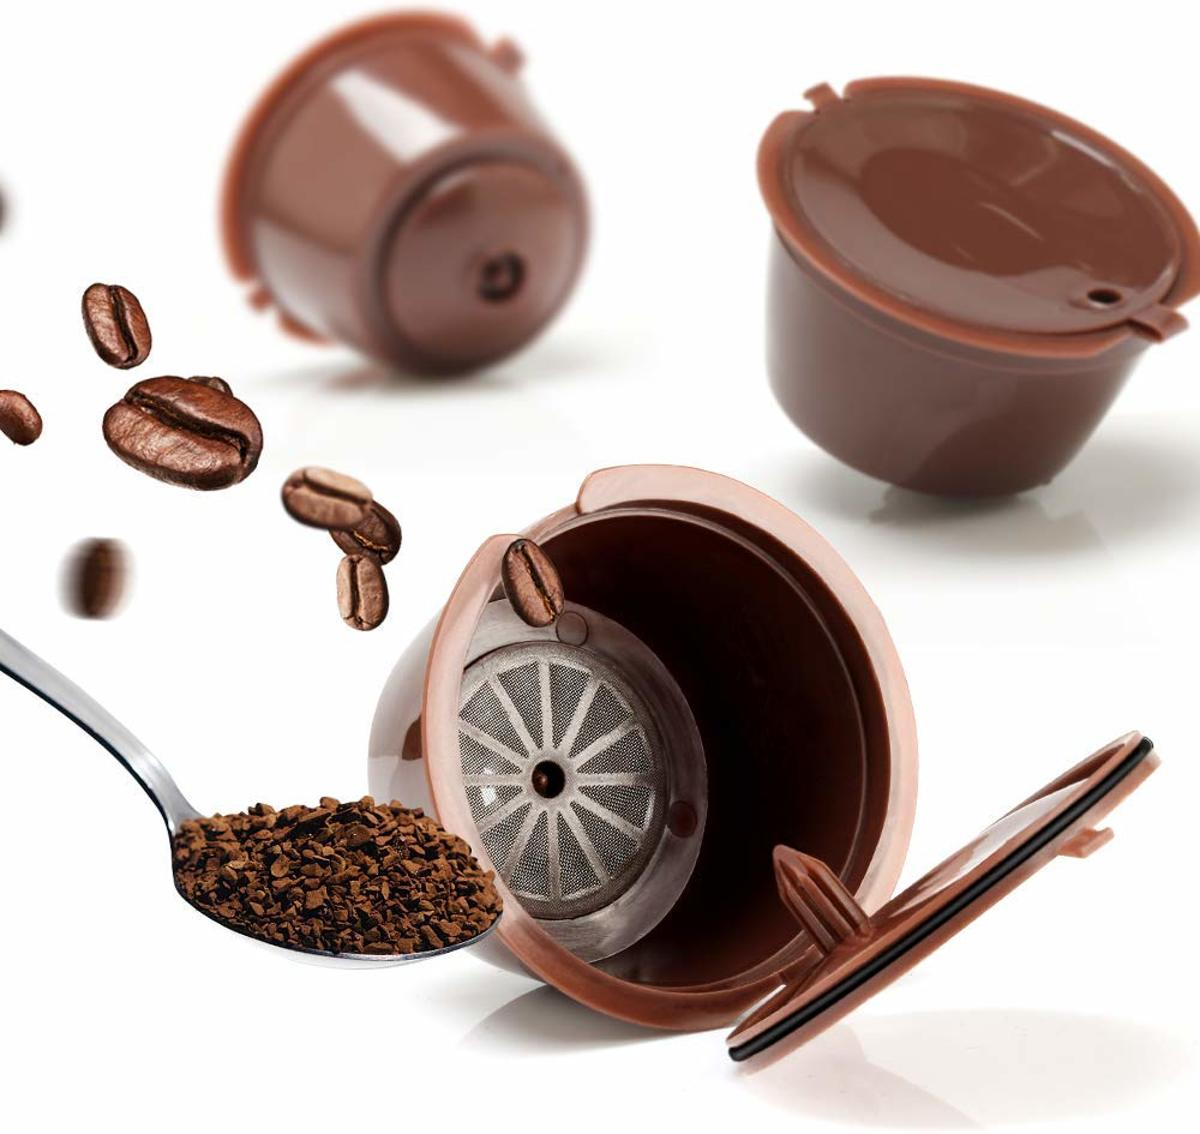 MIRO | 6x Hervulbare Dolce Gusto cups | Koffiecups | Koffie capsule| hervul baar kopen